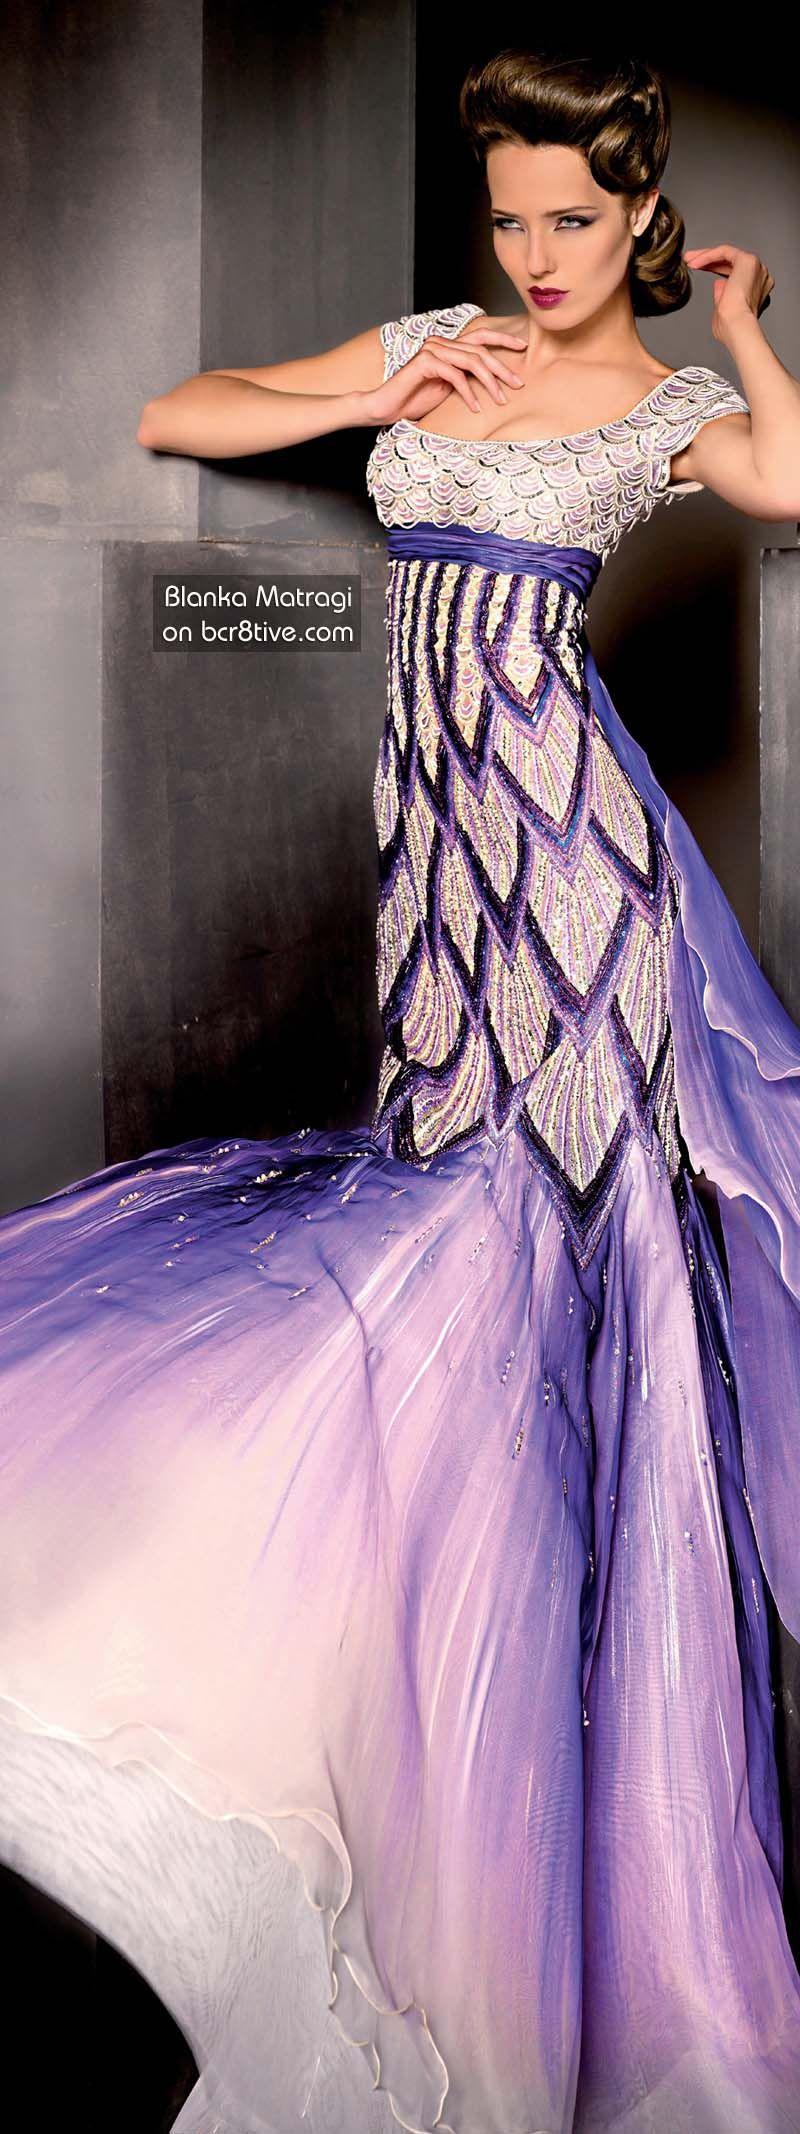 The Versatile Talents of Artisan Blanka Matragi | Pinterest | Alta ...